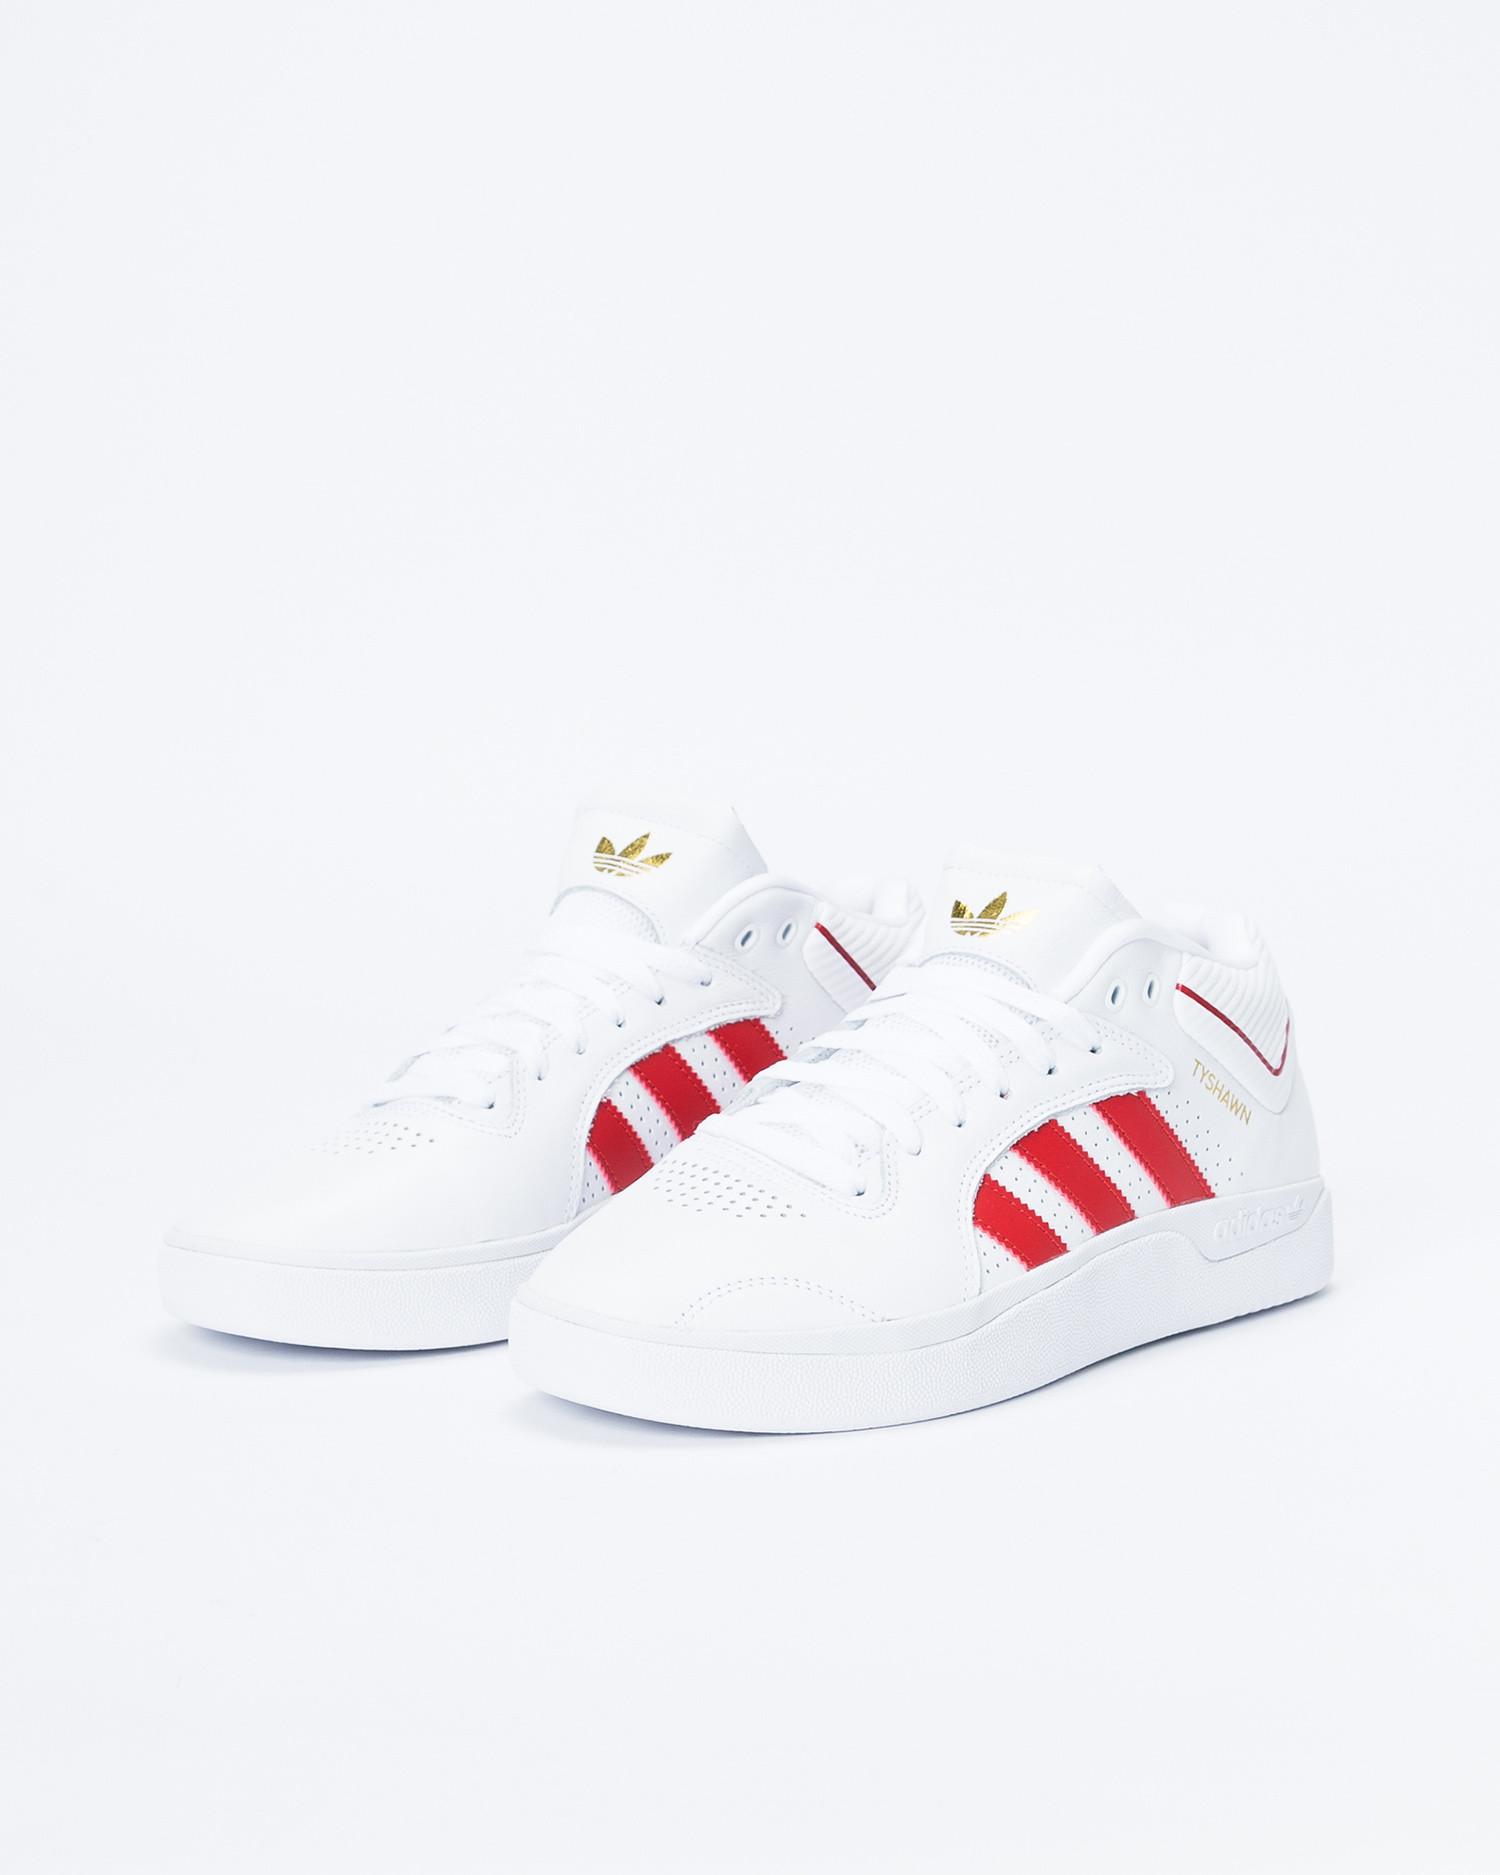 Adidas Tyshawn Footwear White/Scarlet/Footwear White